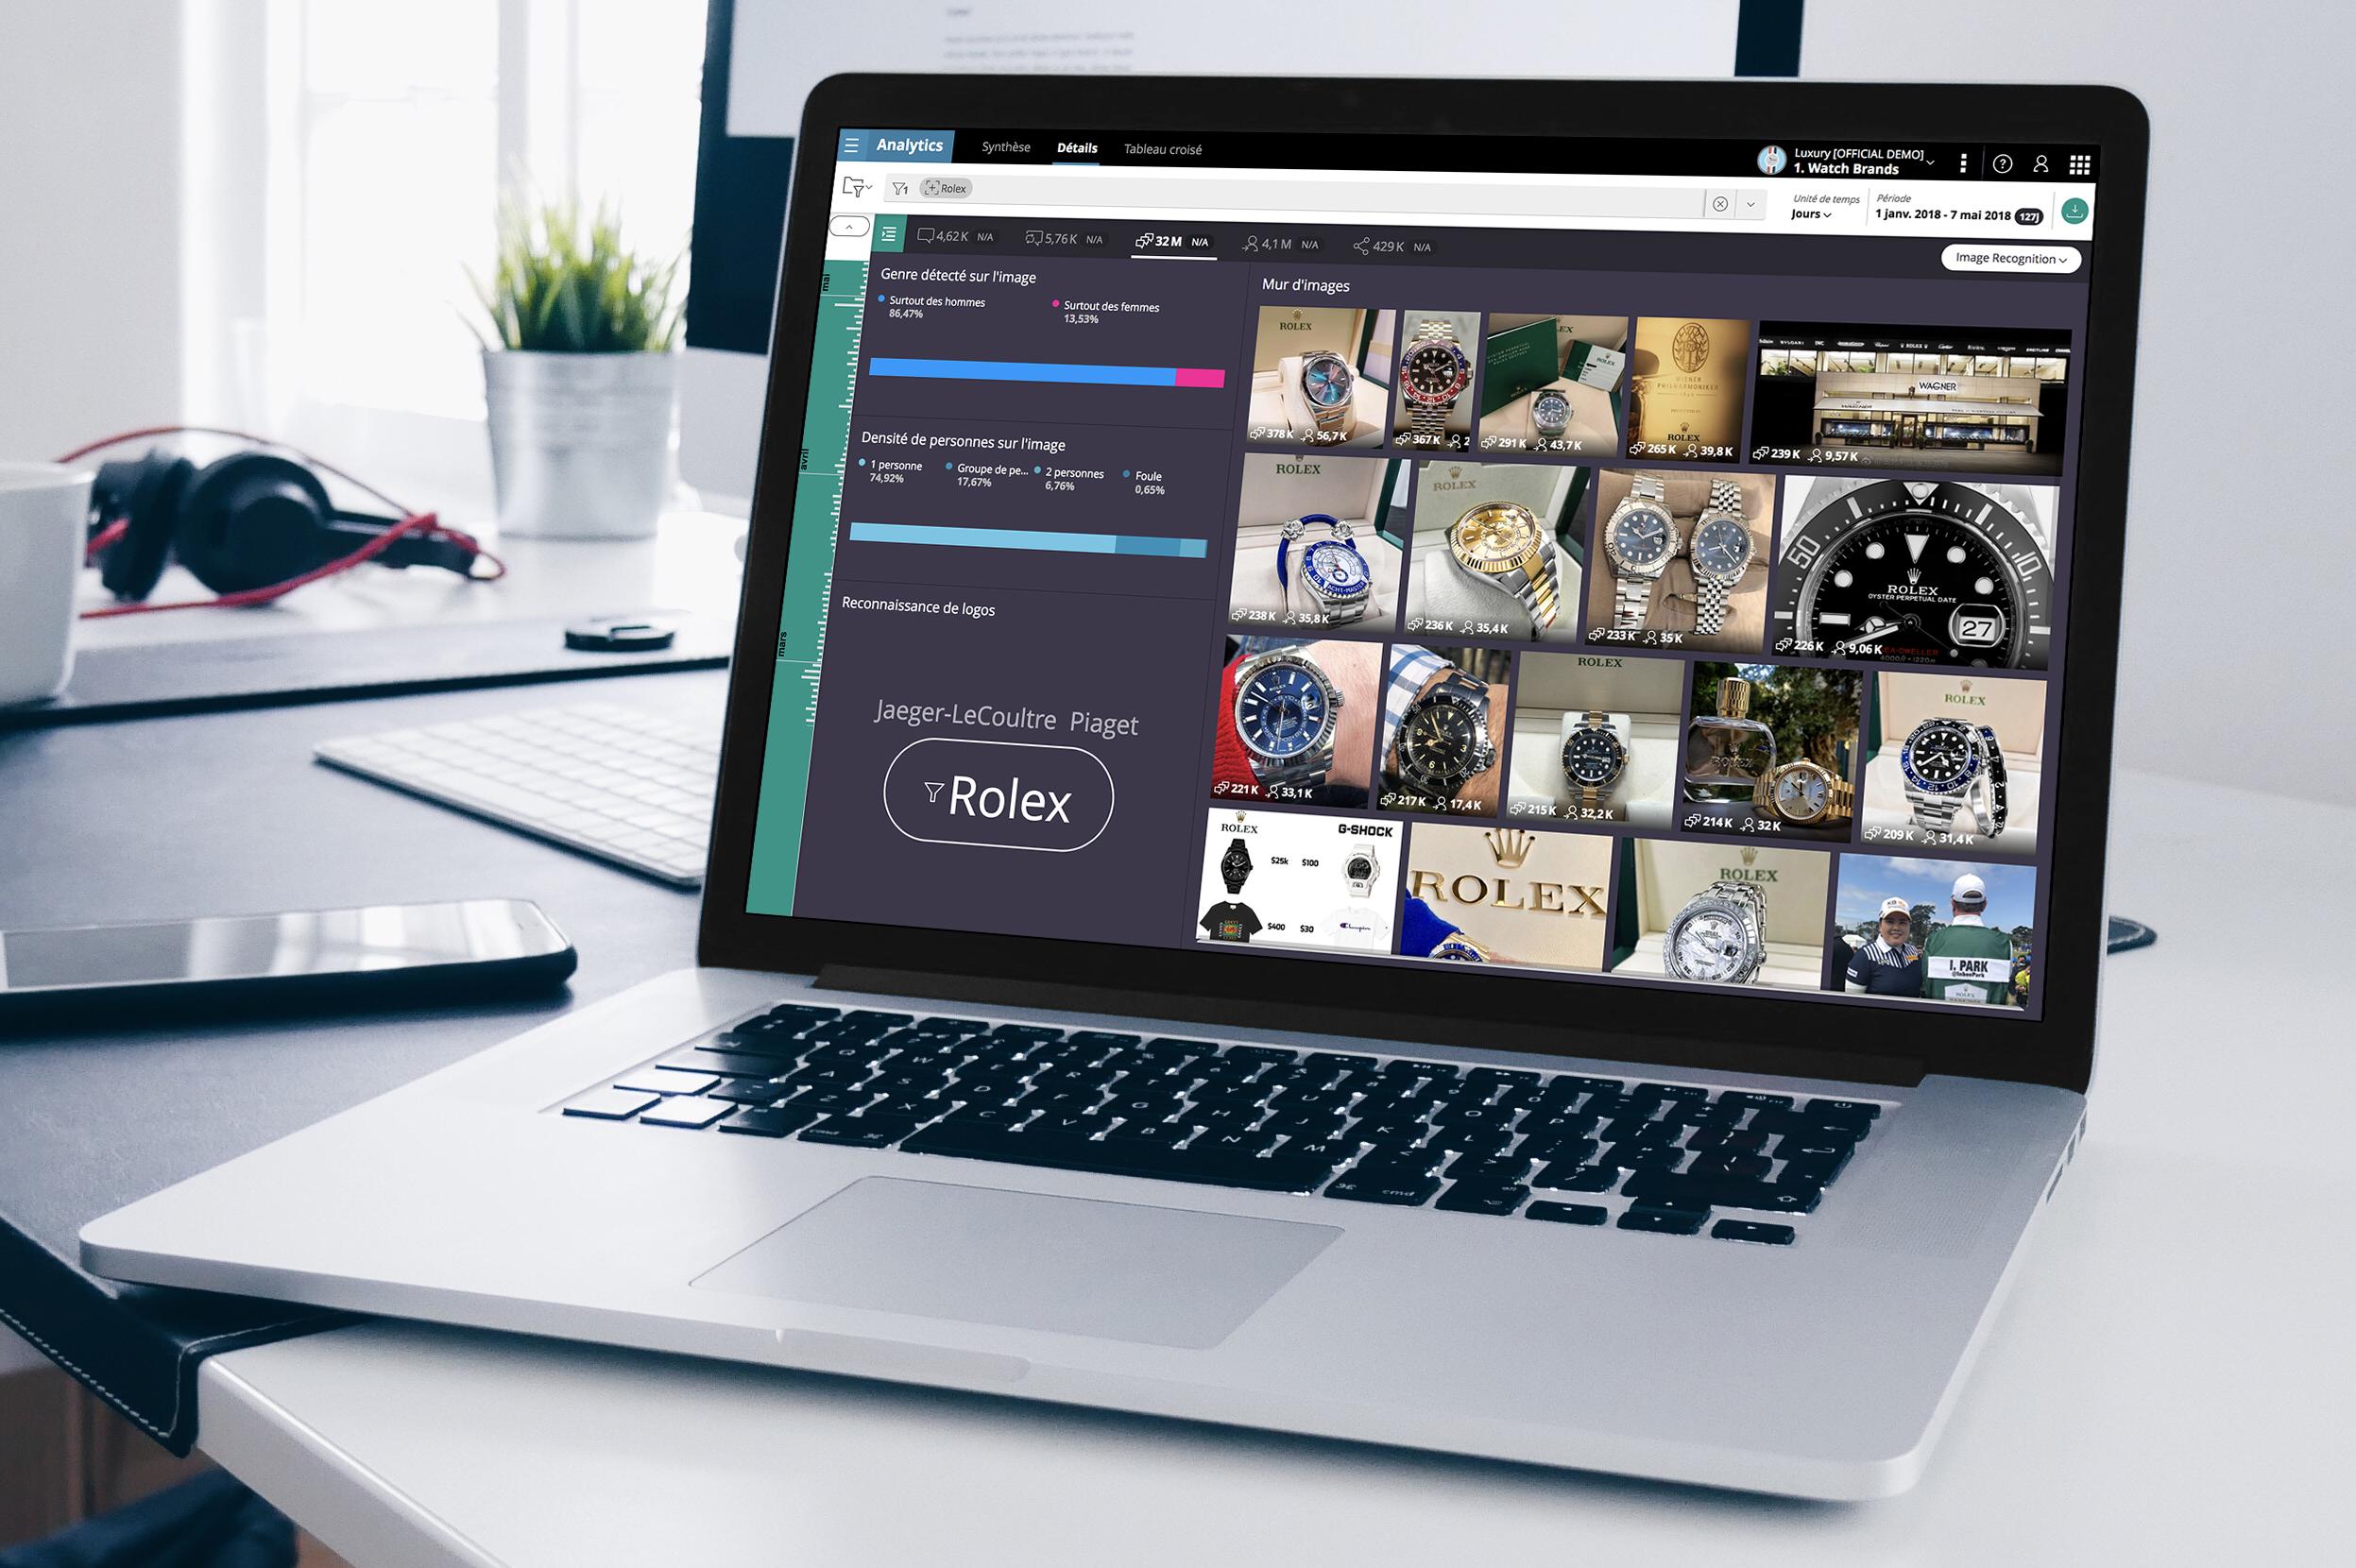 Radarly Demo - Radarly - image recognition